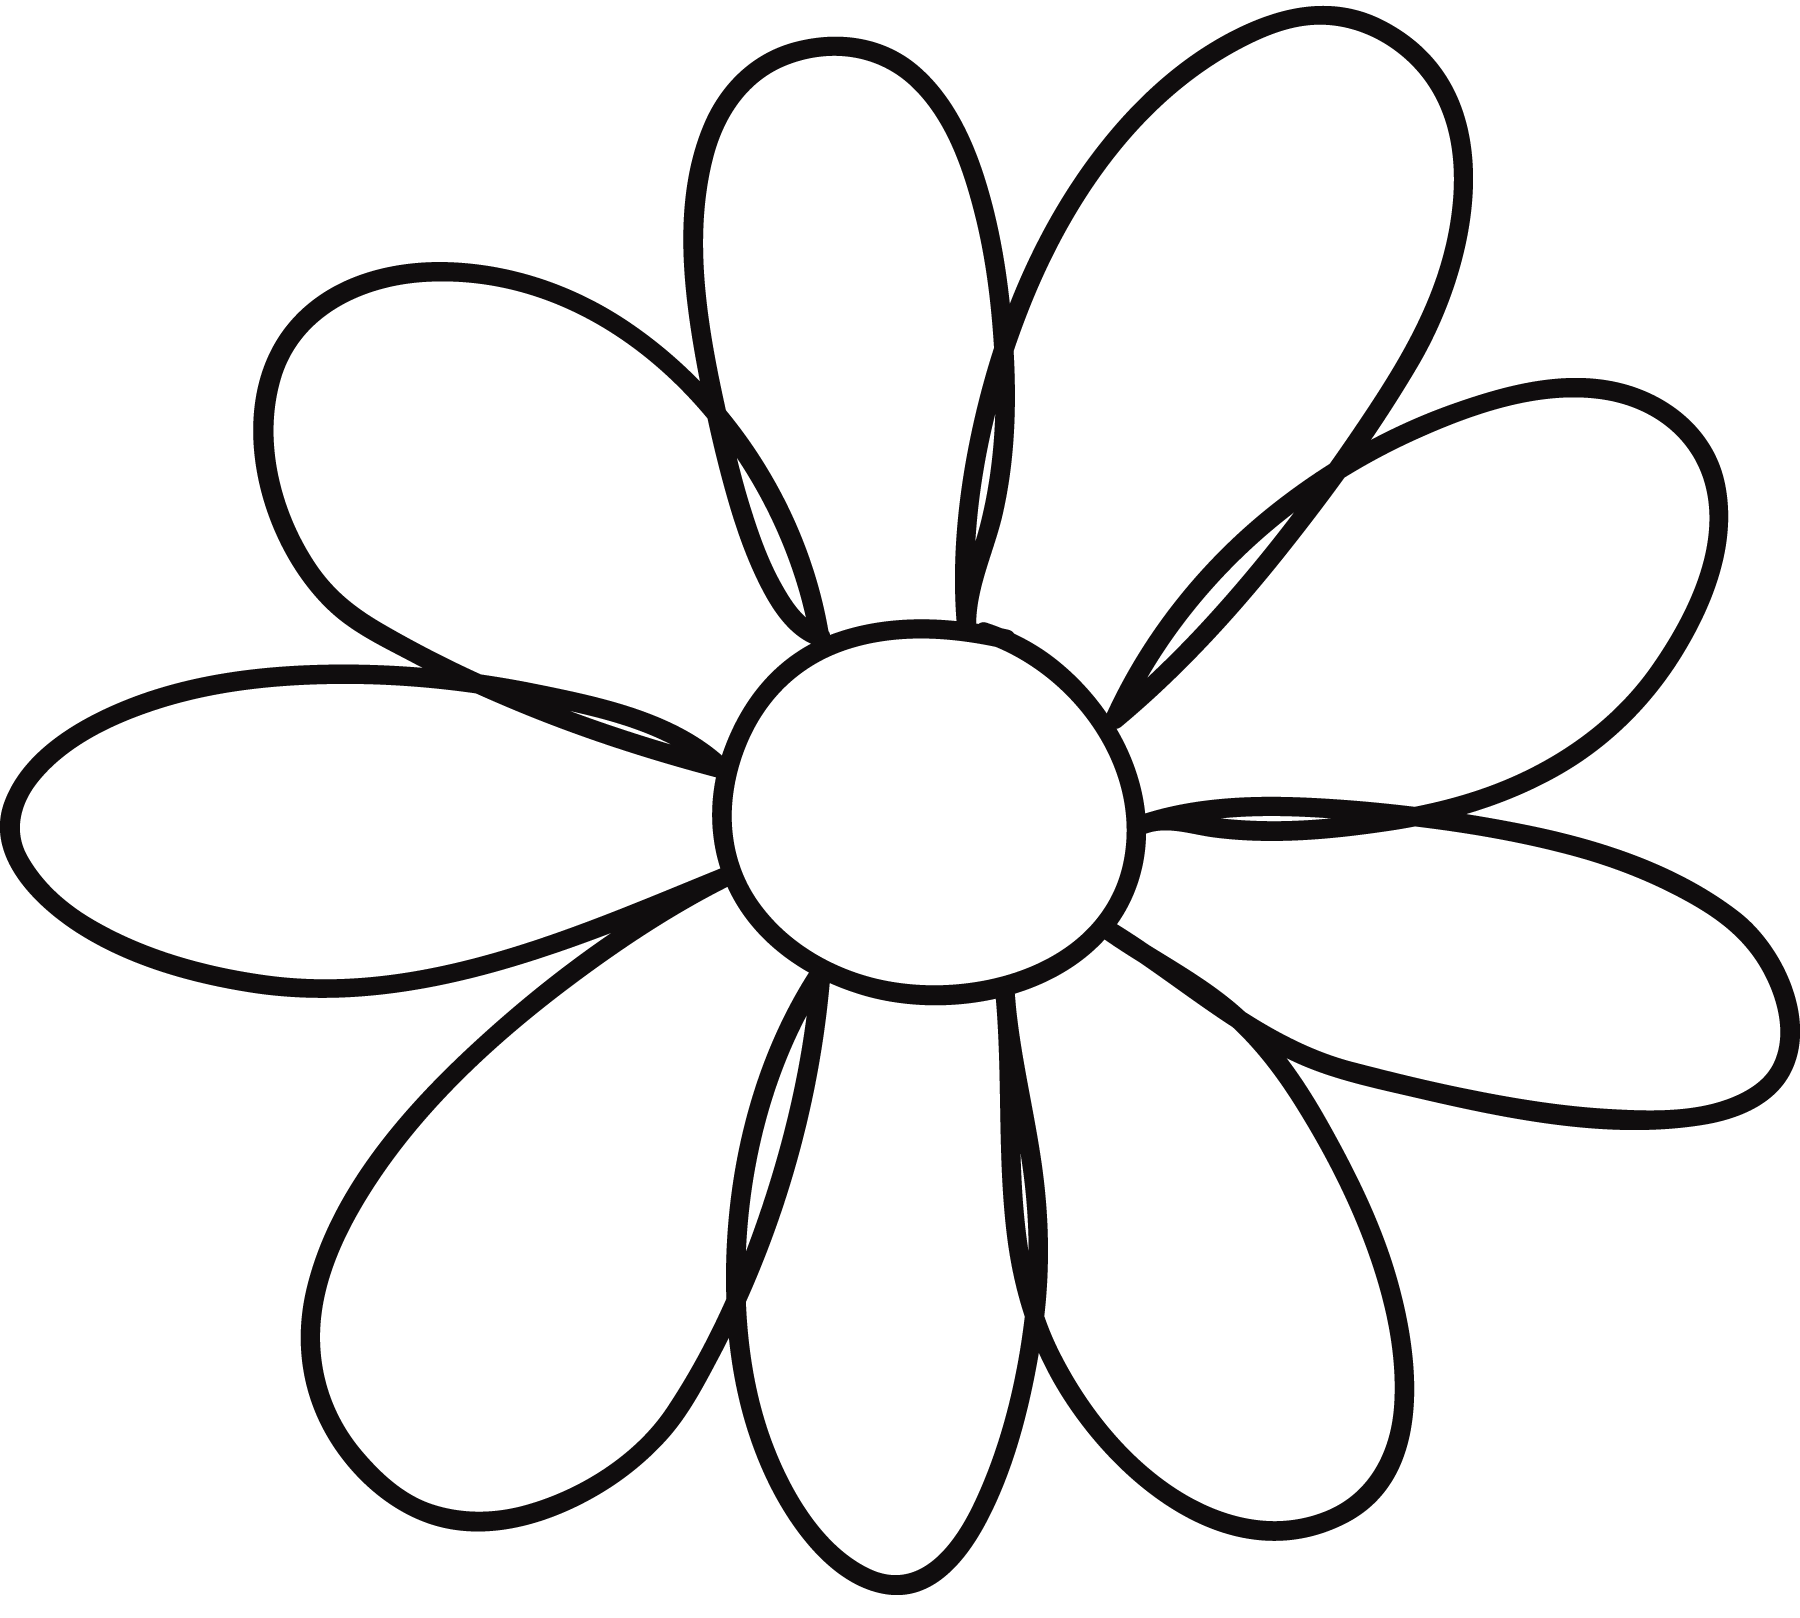 Floral template clipart. Printable flower stencil